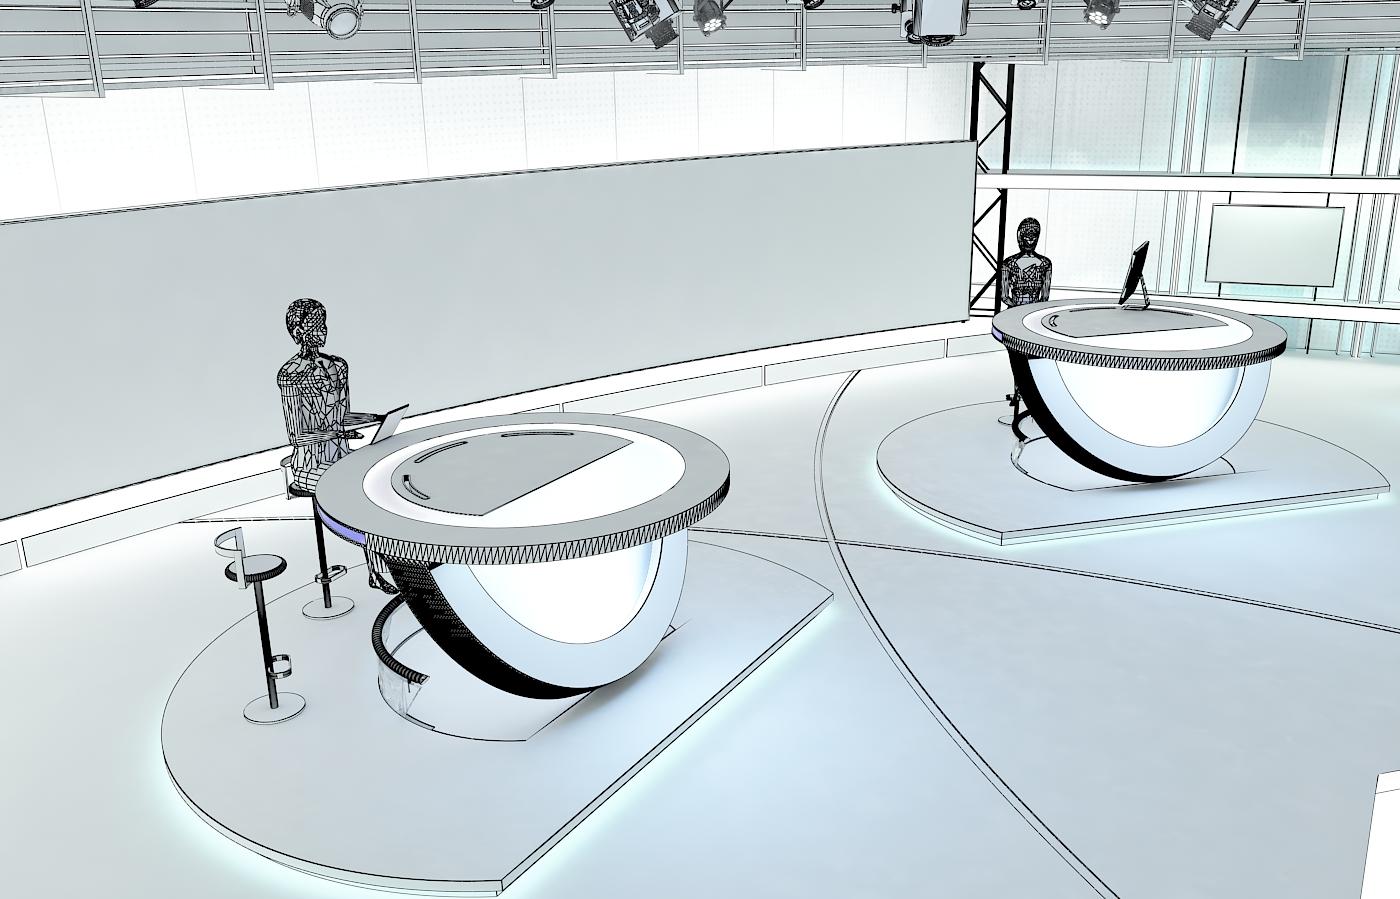 виртуал телевизийн студи цуглуулга vol 6 3d загвар max dxf dwg fbx obj 223406